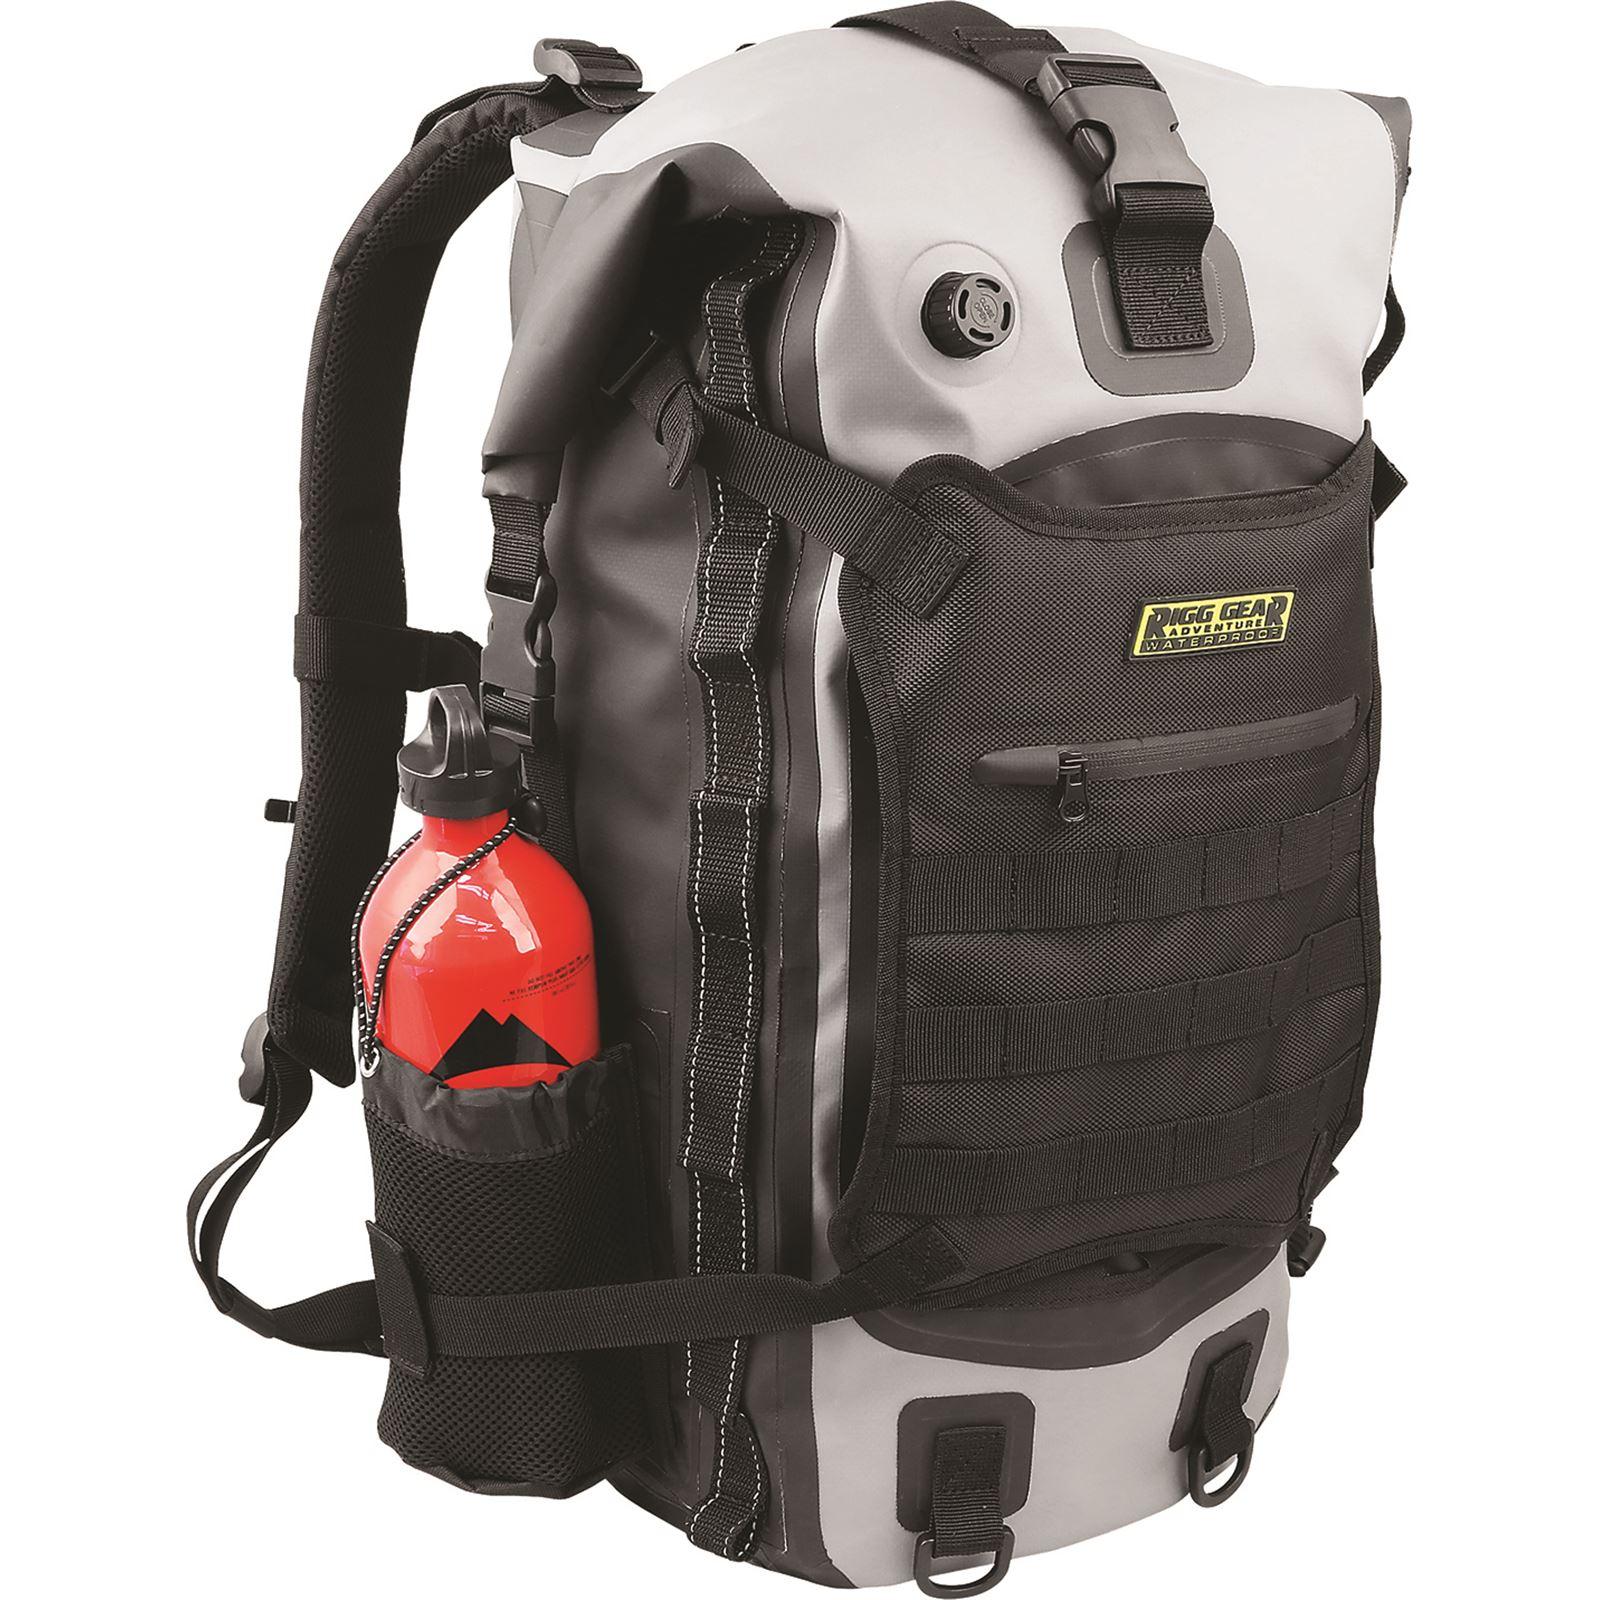 Nelson-Rigg Hurricane Waterproof Backpack / Tailpack